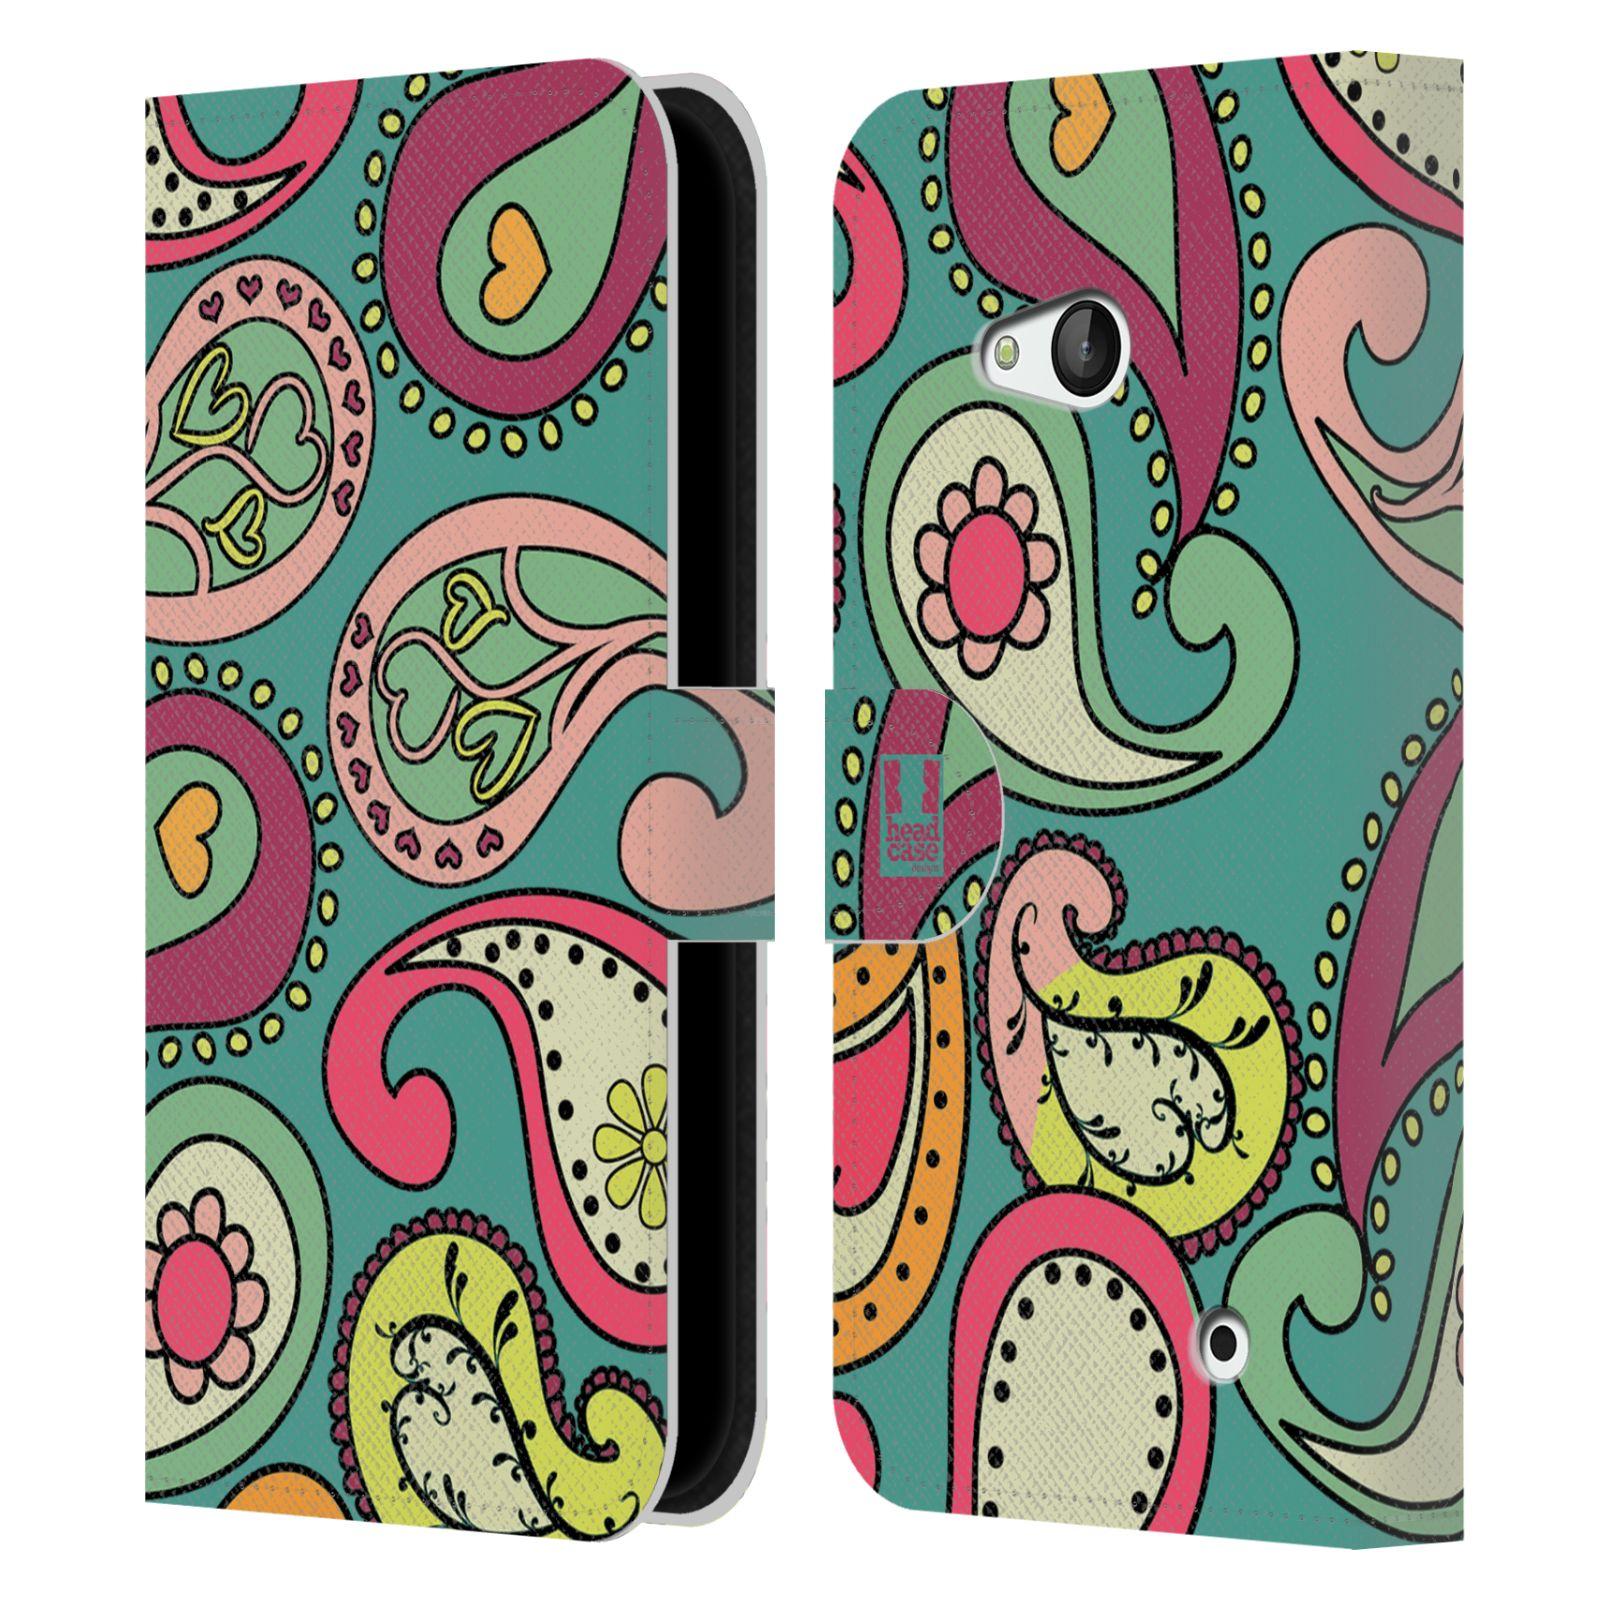 HEAD CASE Flipové pouzdro pro mobil NOKIA / MICROSOFT LUMIA 640 / LUMIA 640 DUAL barevné slzy tyrkysová